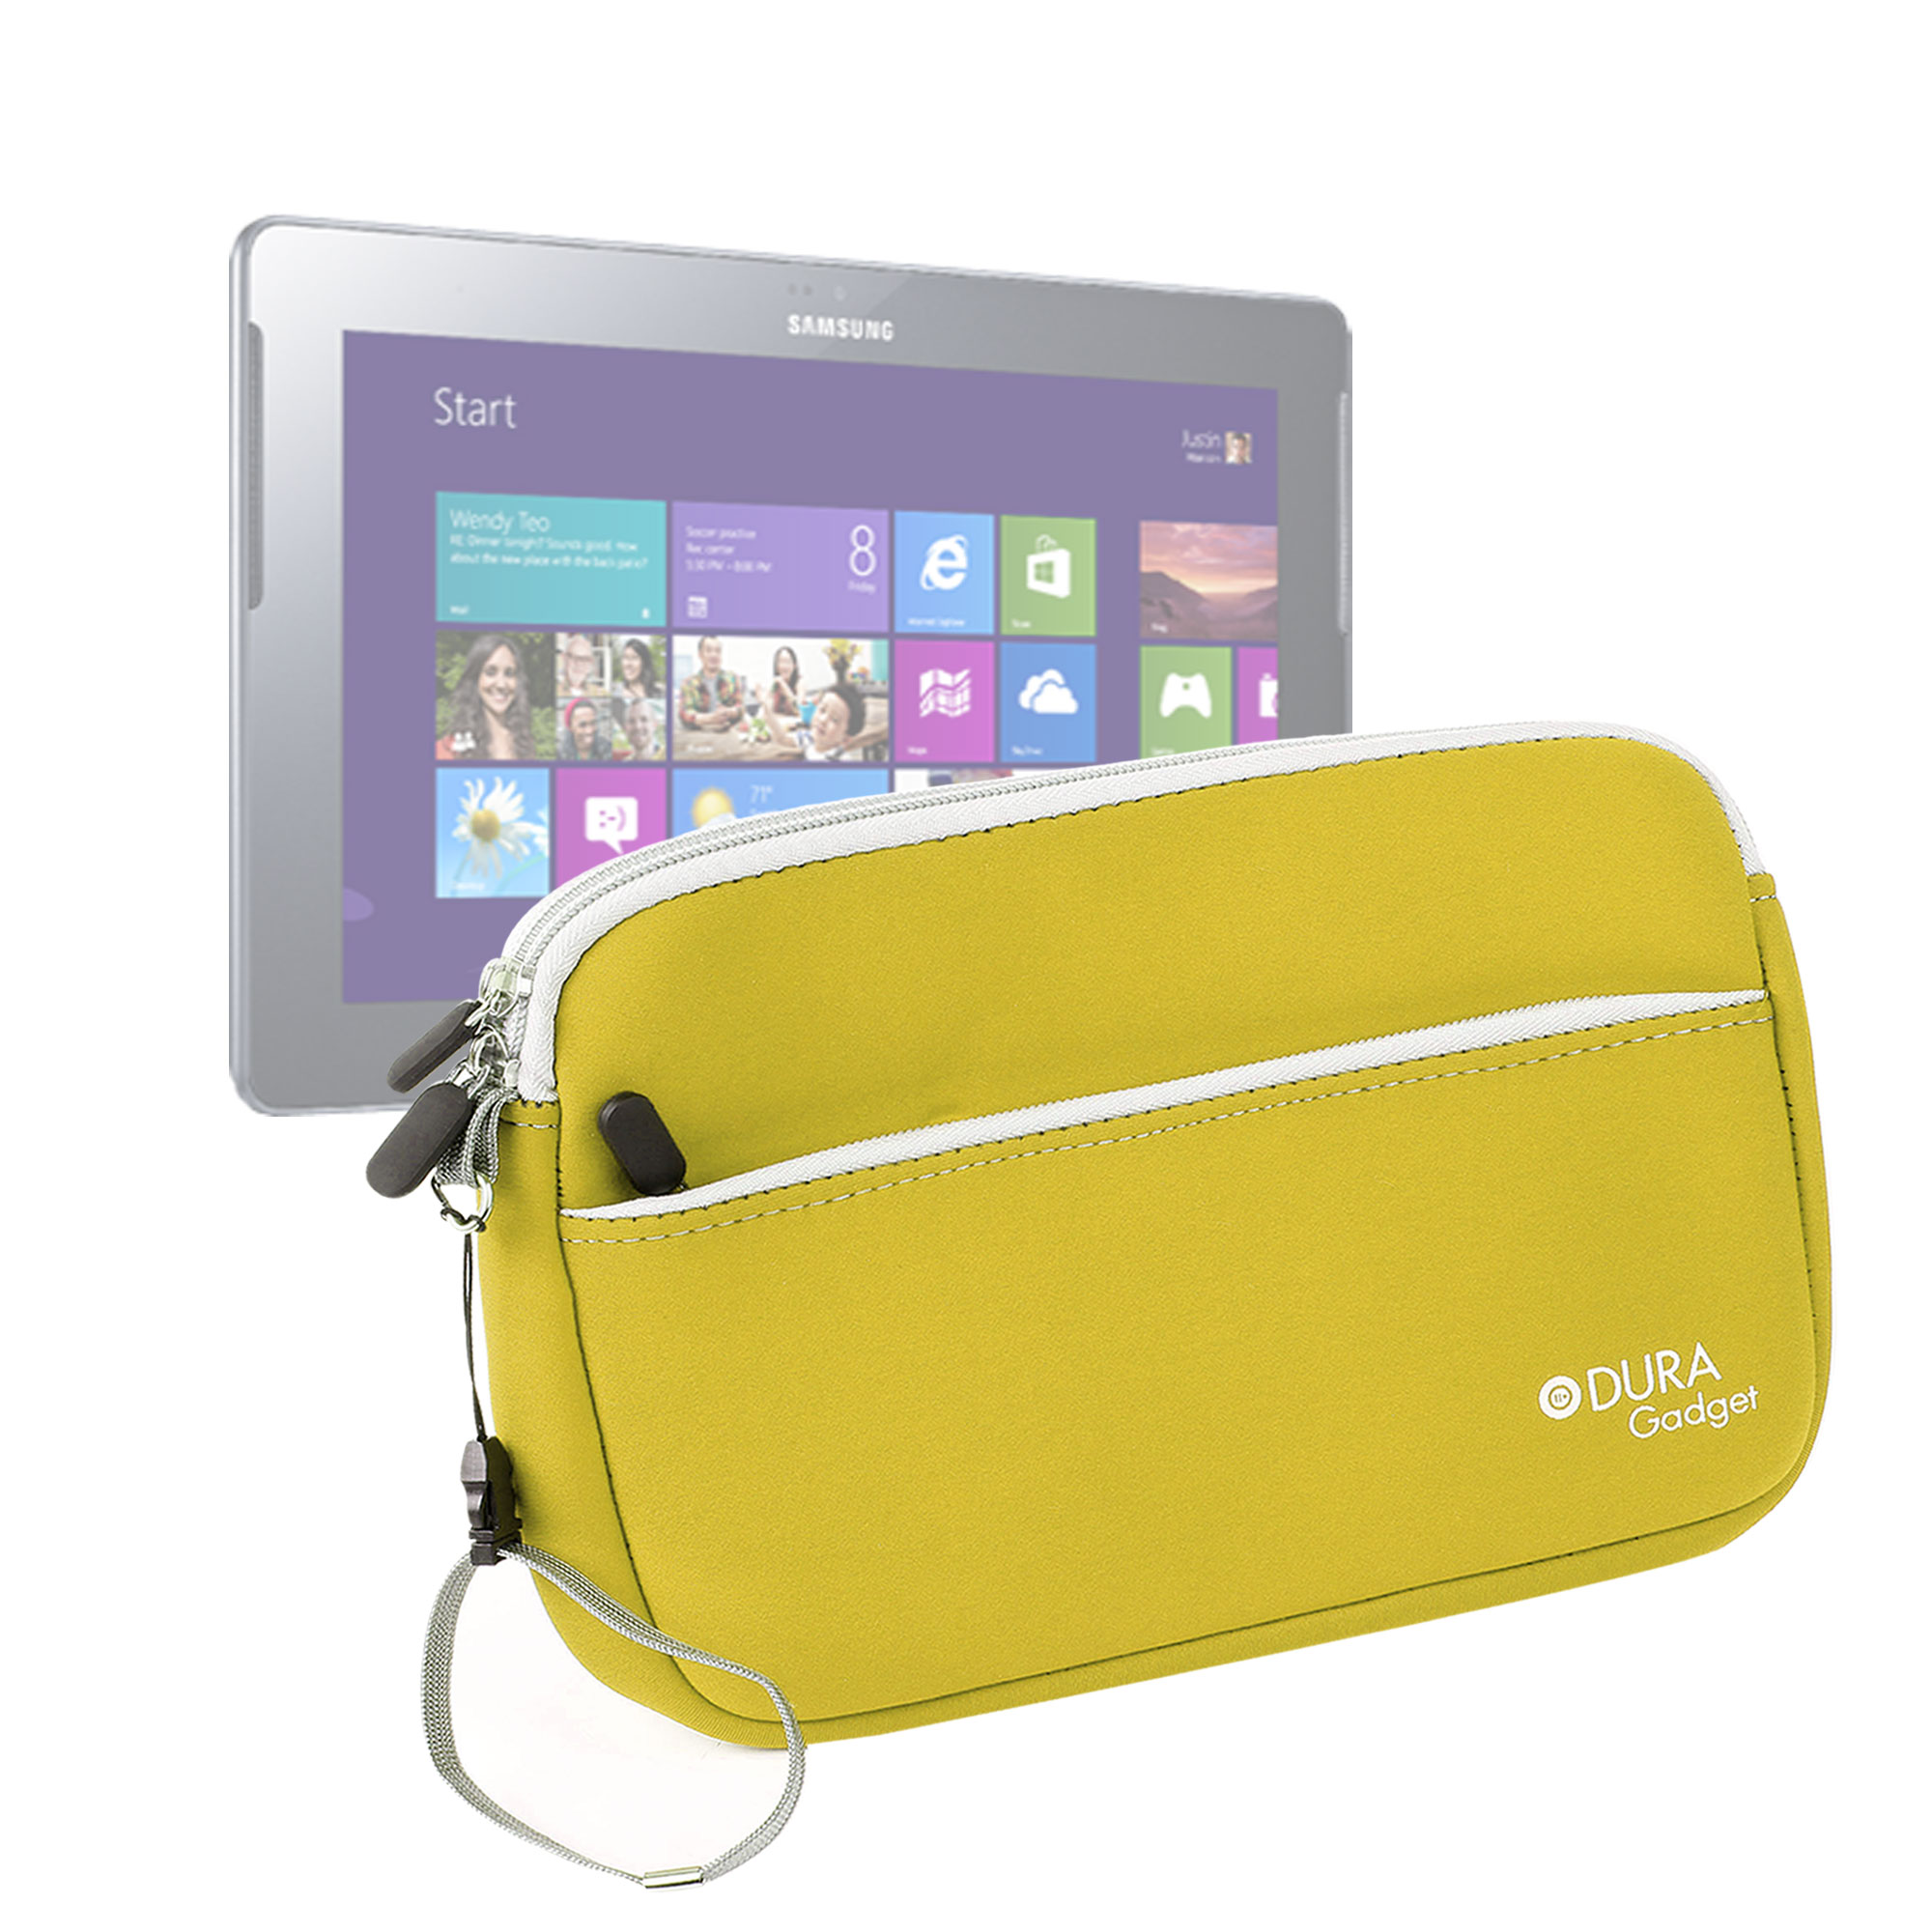 Housse tui jaune pour tablette samsung ativ tab 10 1 for Housse tablette samsung